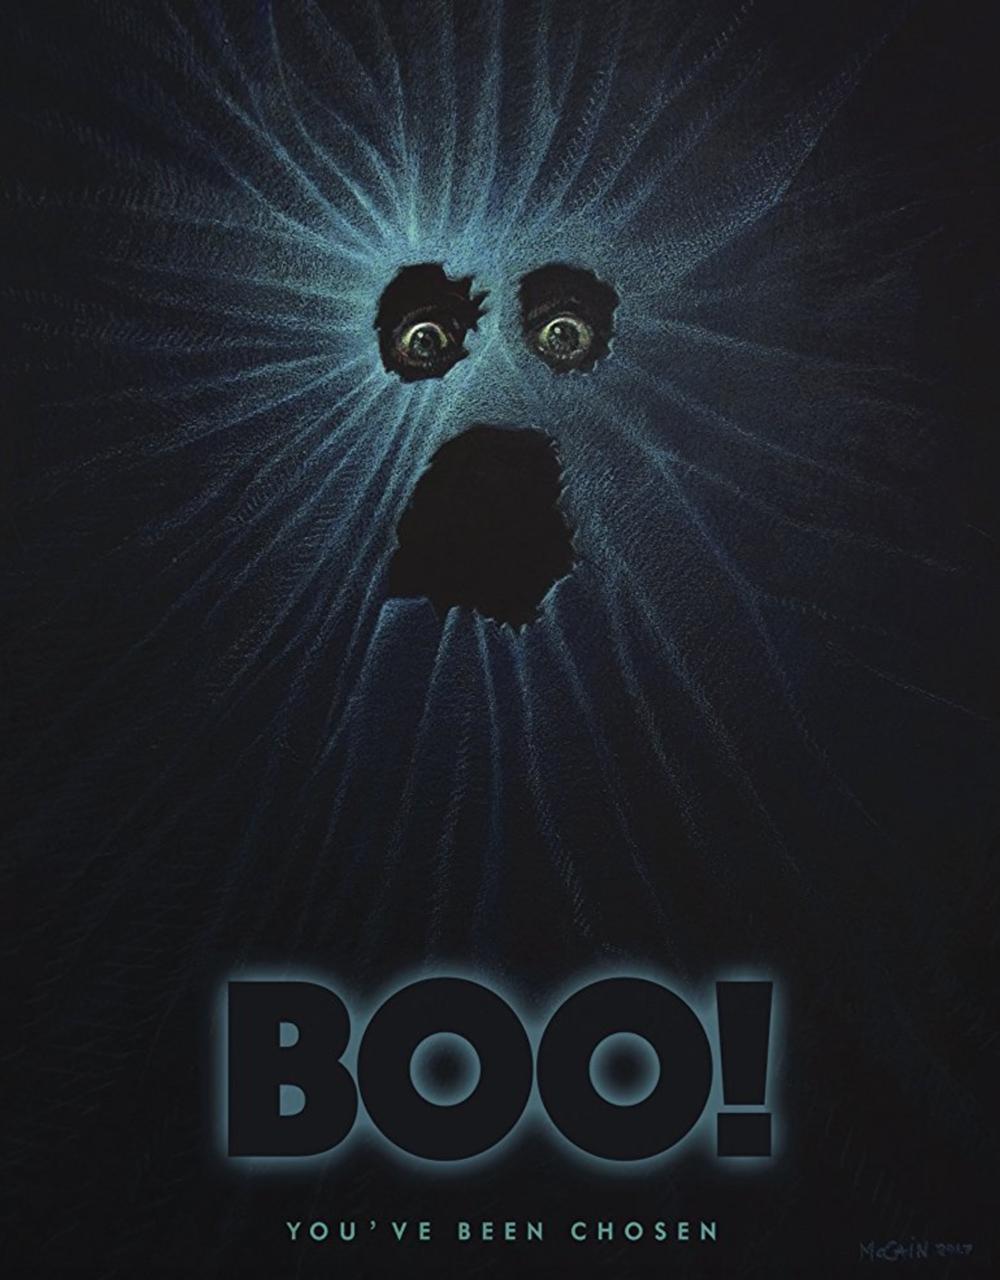 BOO!  VFX SUPERVISOR  Conform and Comp - Flame 2017.1.1 - Nuke - Cinema 4D - Zbrush